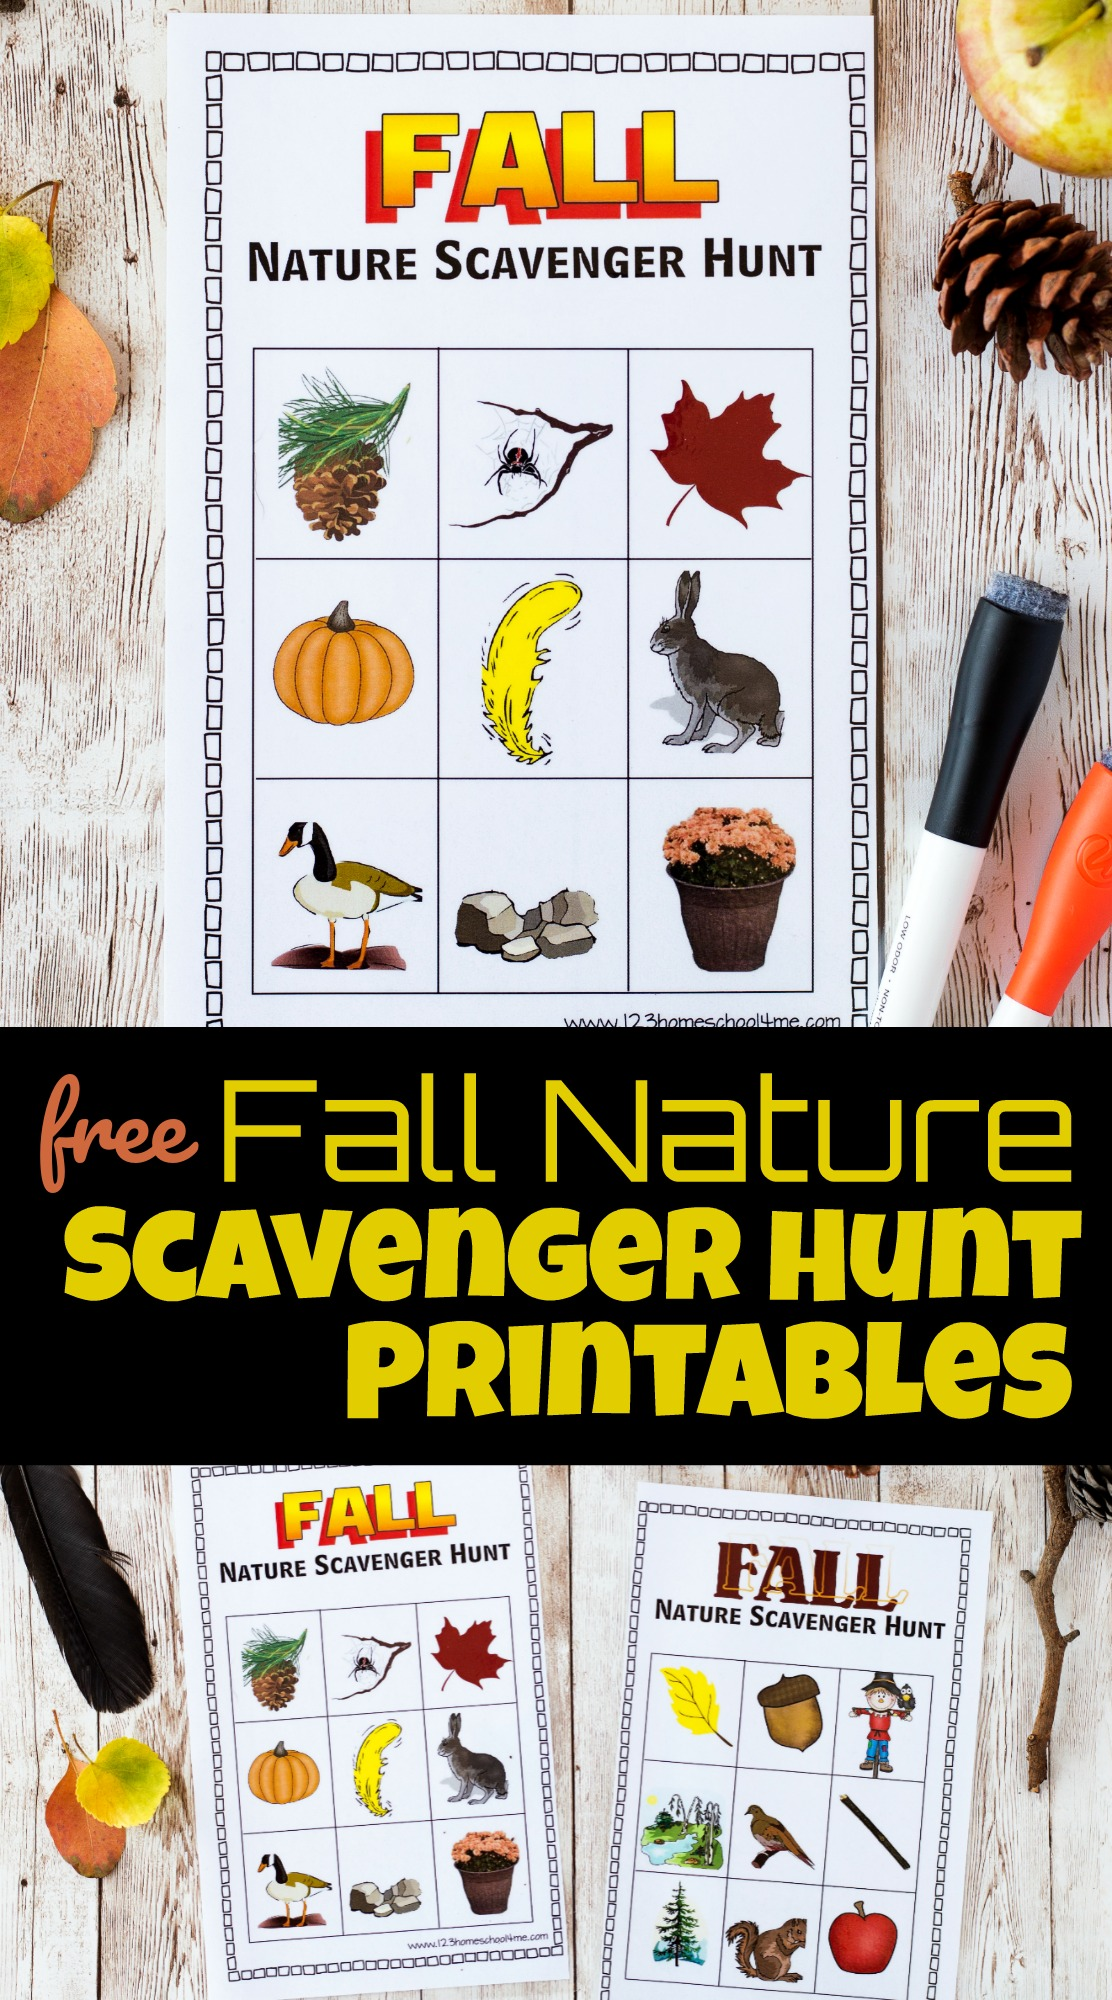 Fall Nature Scavenger Hunt Printables